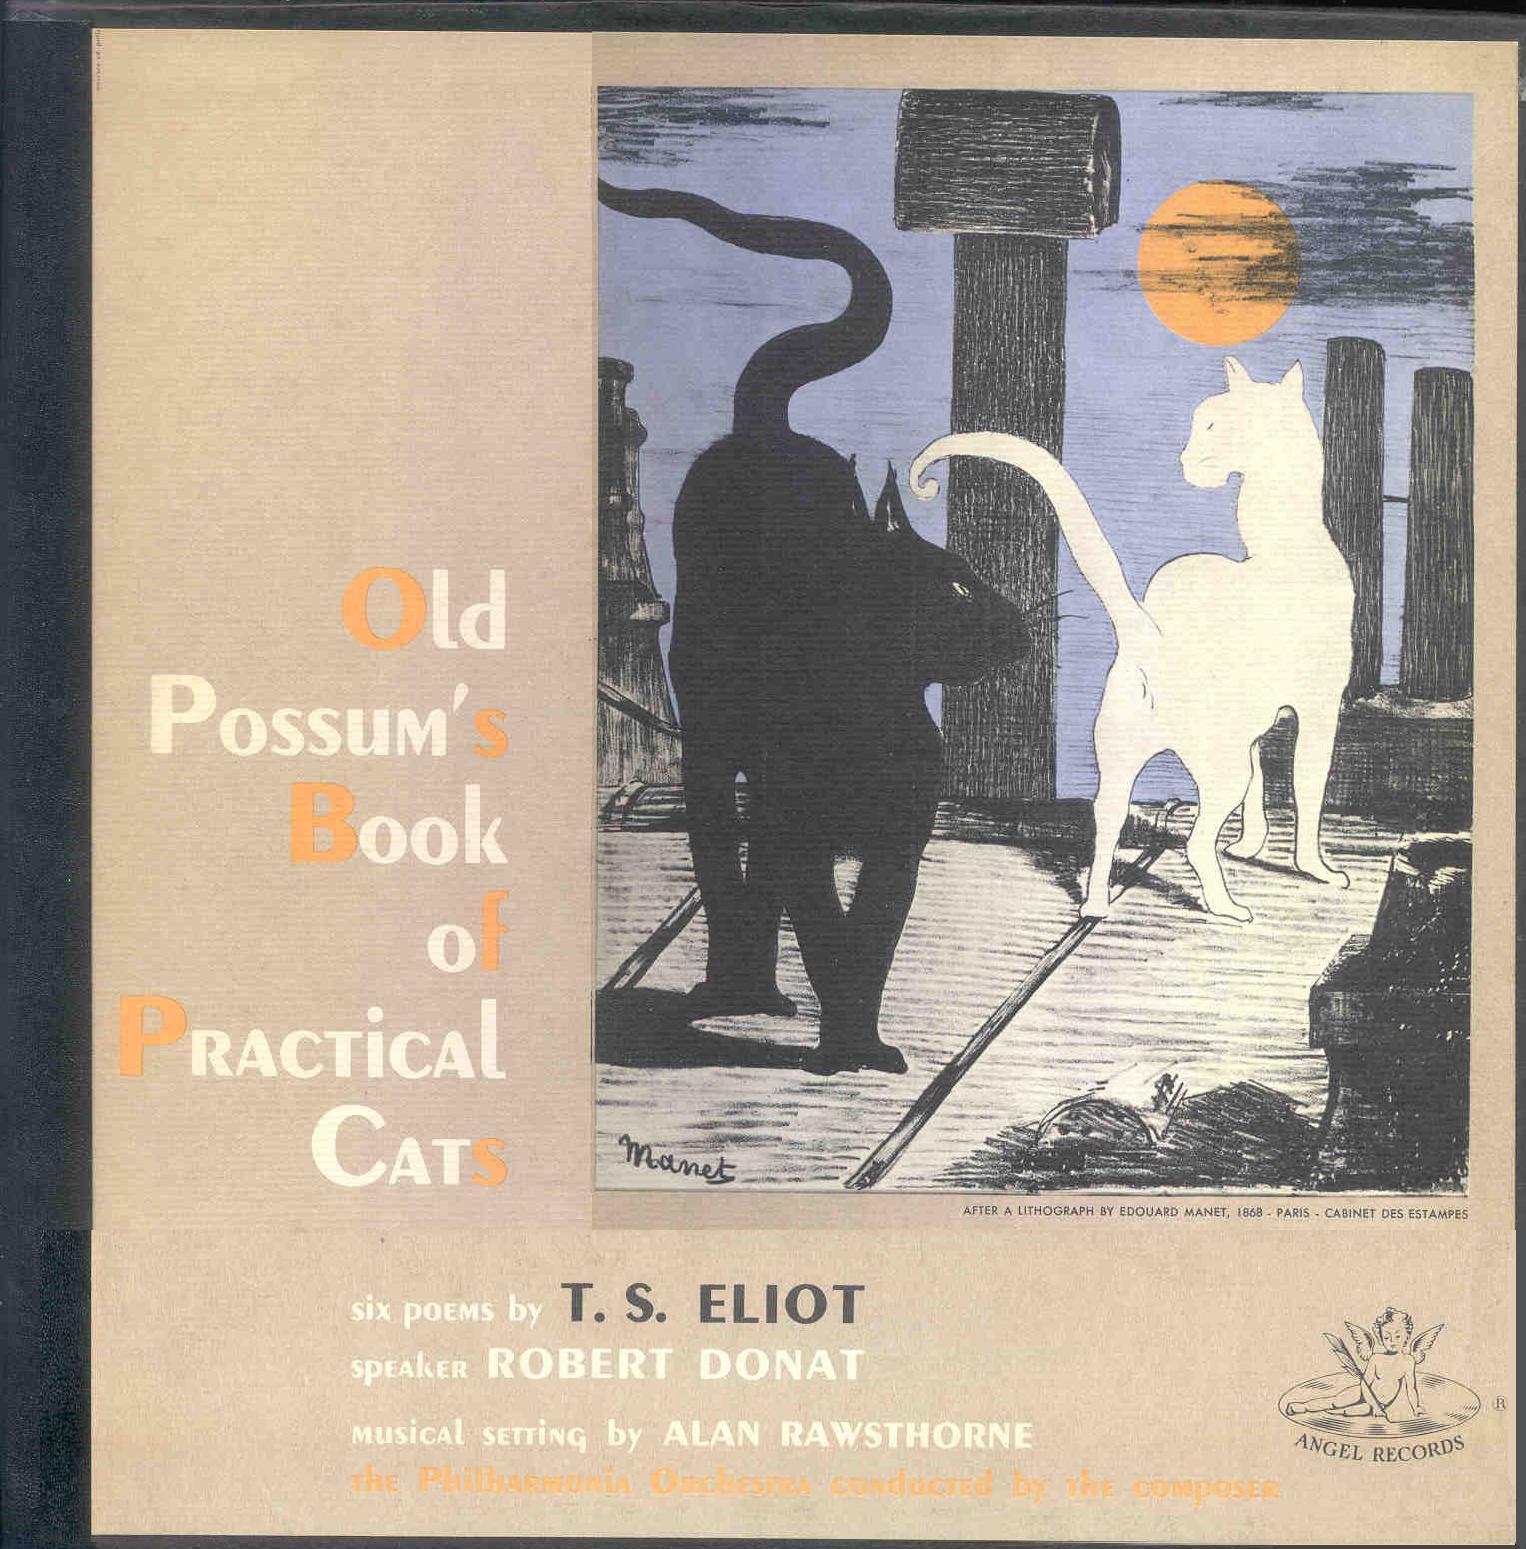 http://1.bp.blogspot.com/_3d0sytkFA_E/TMn0osI2qnI/AAAAAAAABOQ/izbhnNXfpAo/s1600/Practical+Cats+cover.JPG